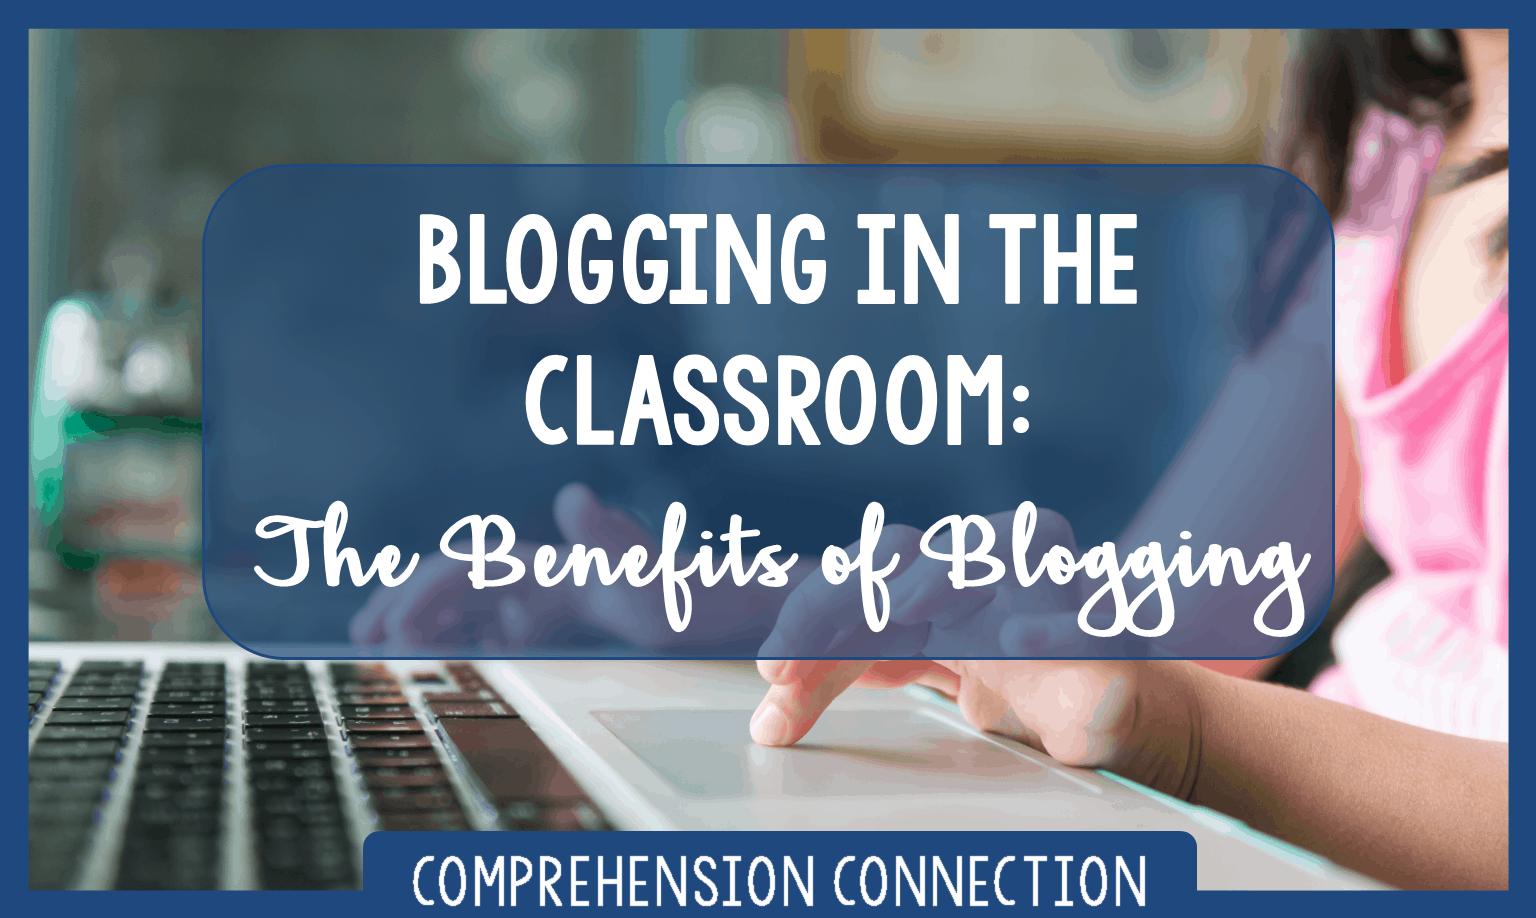 blogging2bin2bthe2bclassroom2-jpg-8769568